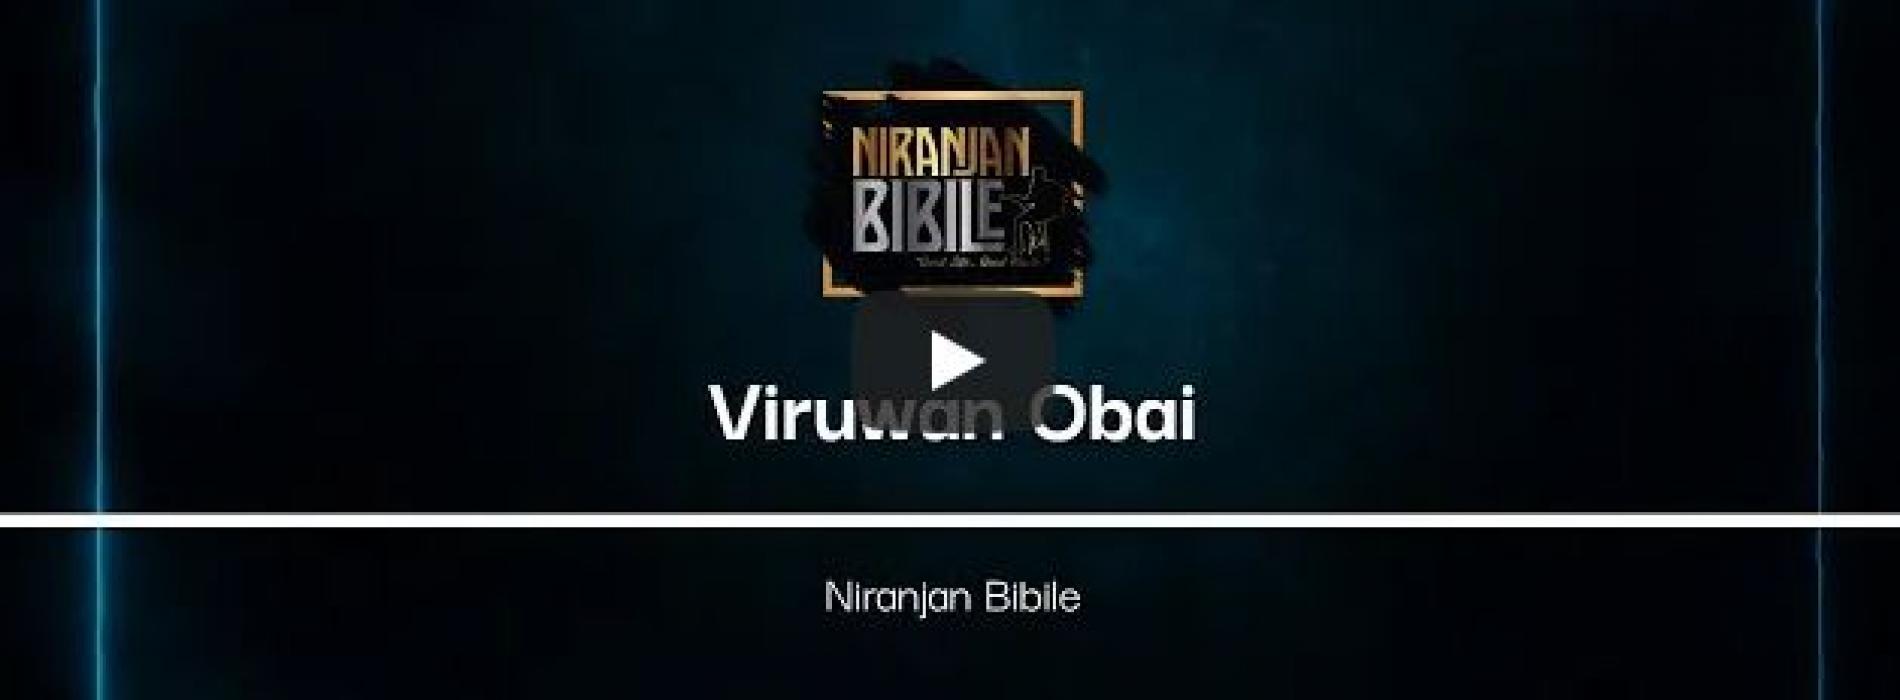 New Music : Niranjan Bibile – Viruwan Obai (Official Audio)